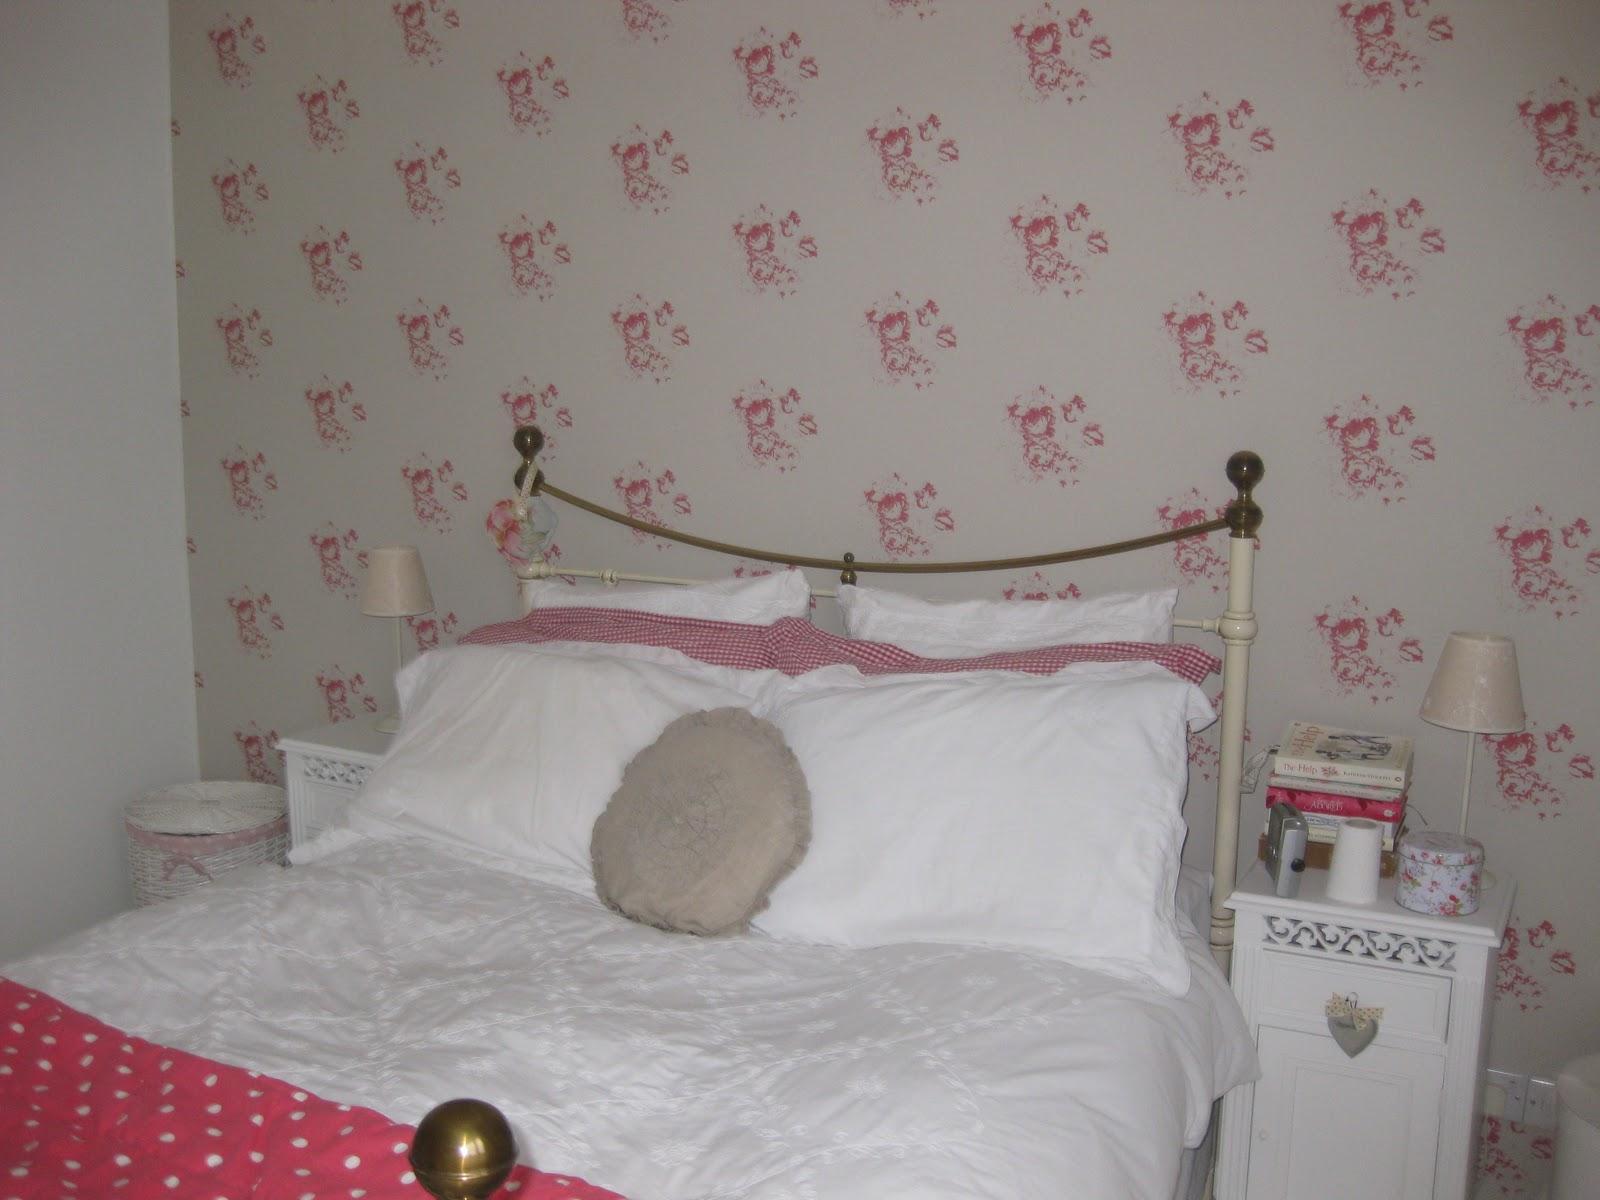 wallpaper wallpaper at dunelm mill. Black Bedroom Furniture Sets. Home Design Ideas